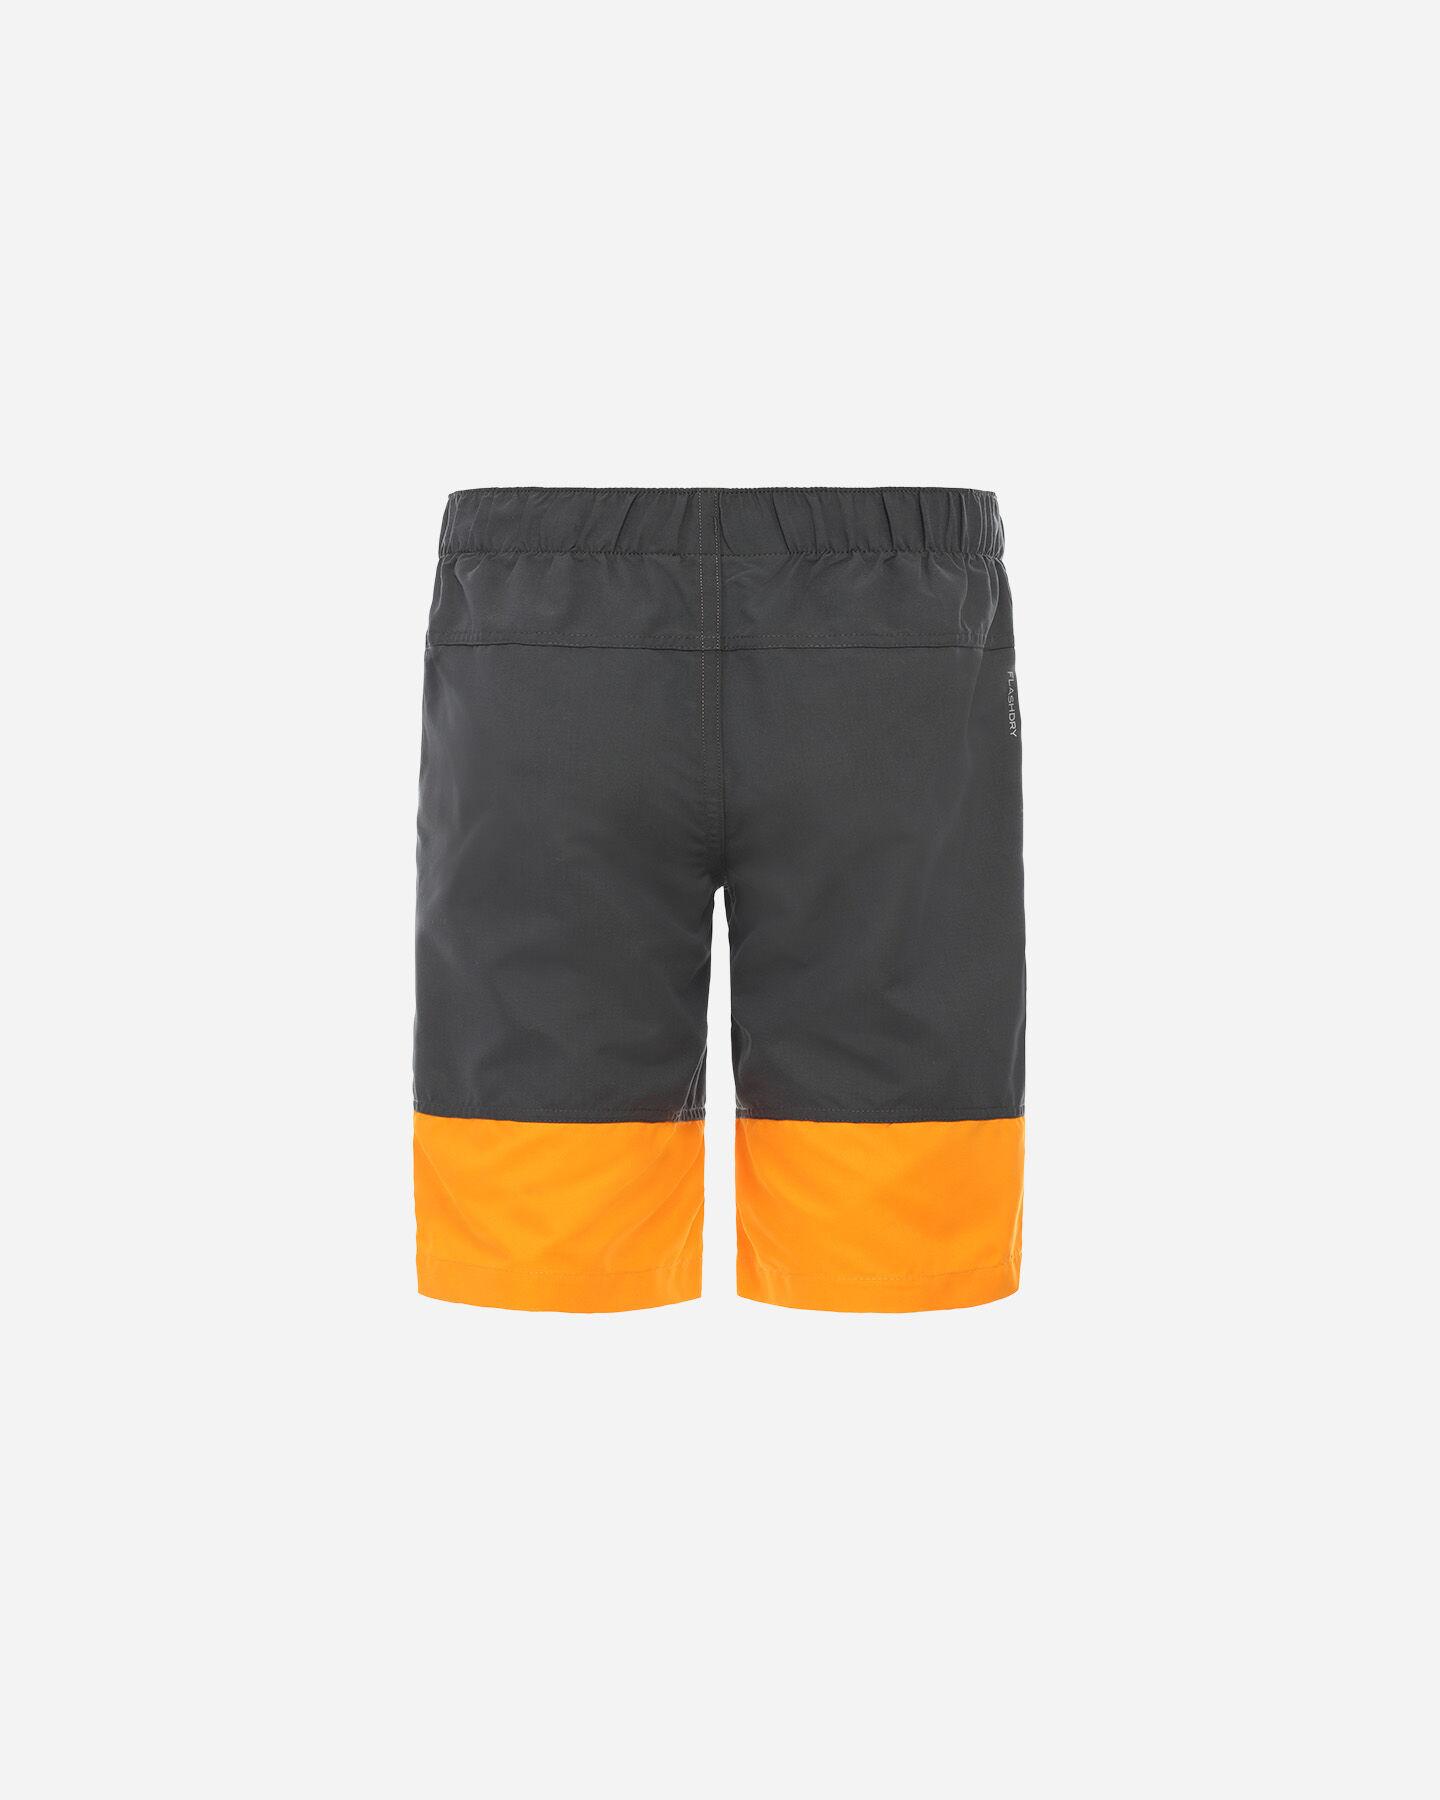 Pantaloncini THE NORTH FACE CLASS V JR S5202647 scatto 1